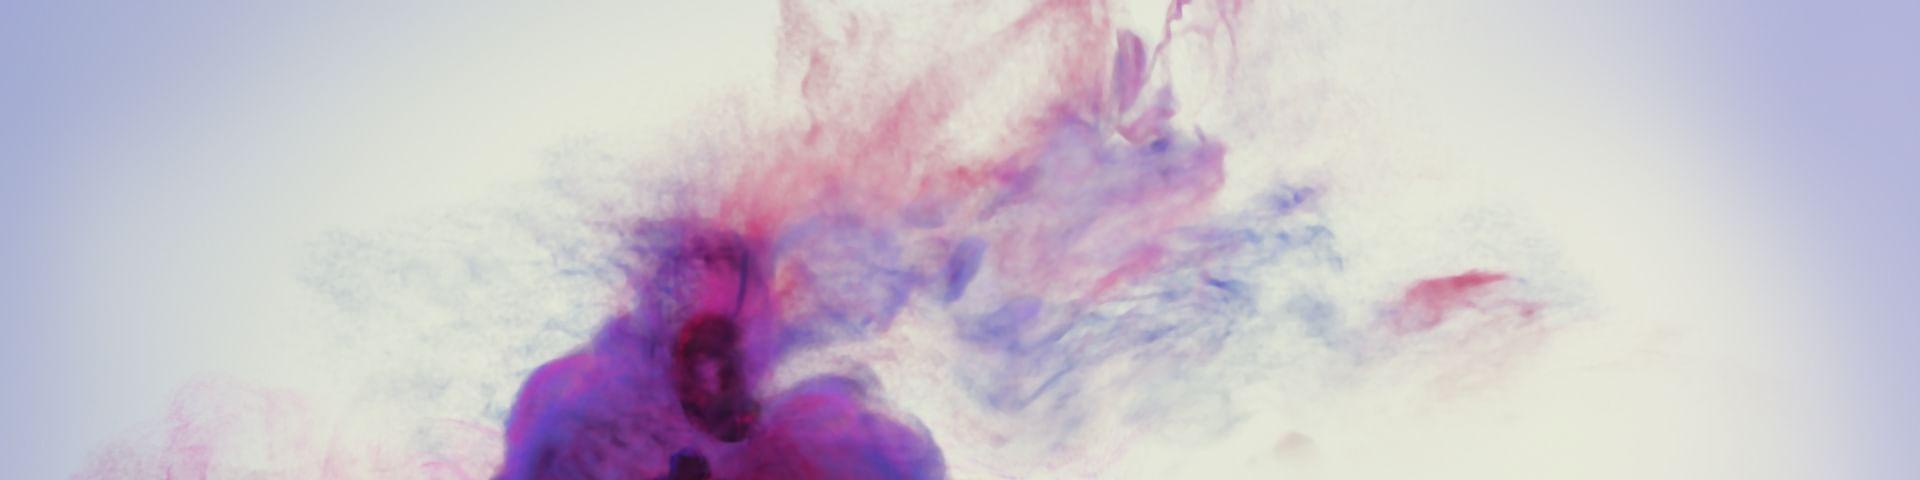 """Vers la lumière"" - Rencontre avec Naomi Kawase"